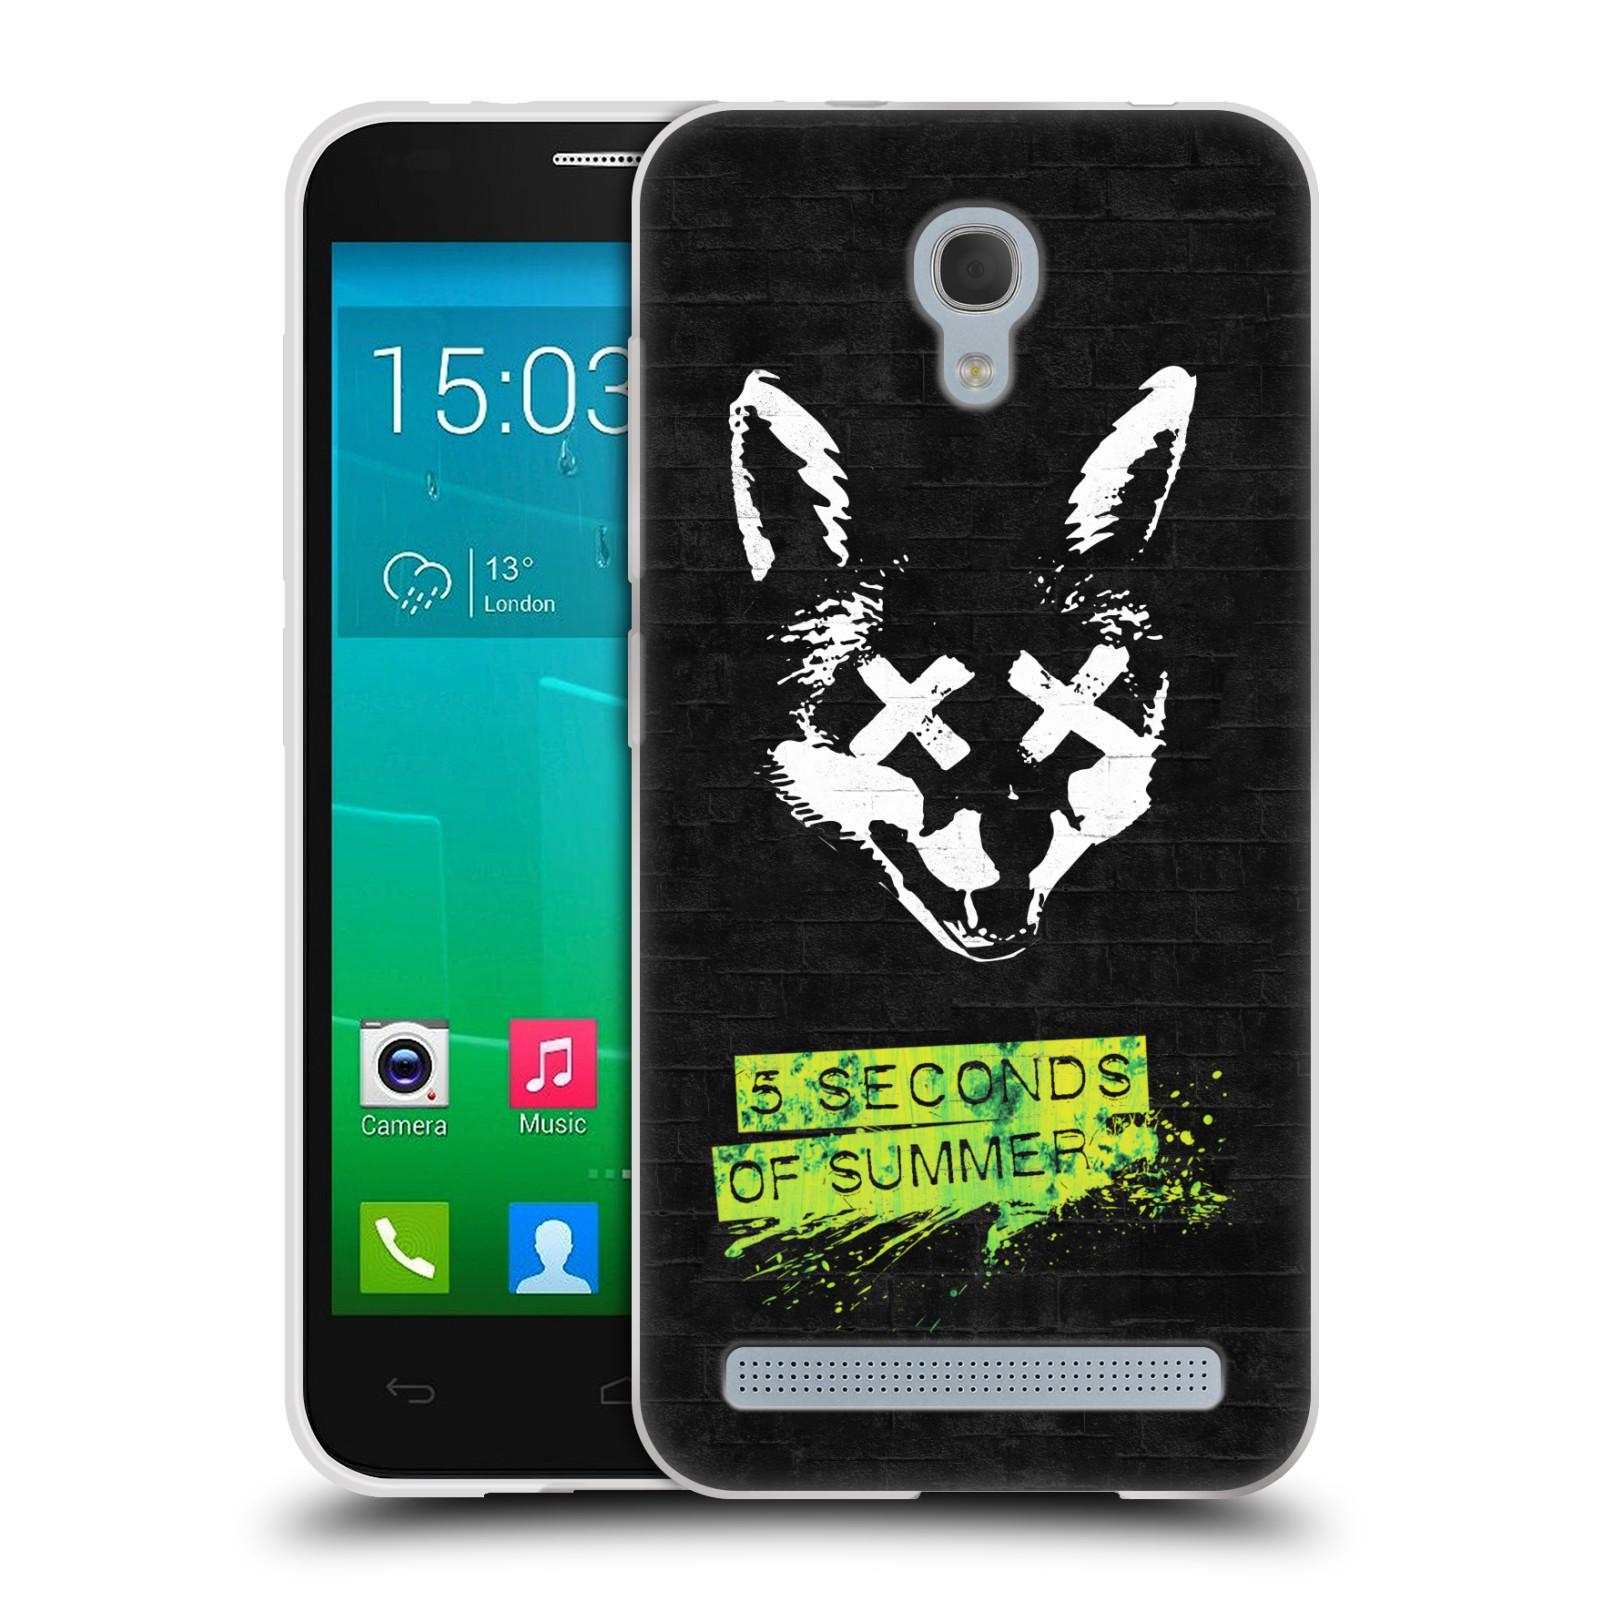 Silikonové pouzdro na mobil Alcatel One Touch Idol 2 Mini S 6036Y HEAD CASE 5 Seconds of Summer - Fox (Silikonový kryt či obal na mobilní telefon licencovaným motivem 5 Seconds of Summer pro Alcatel Idol 2 Mini S OT-6036Y)